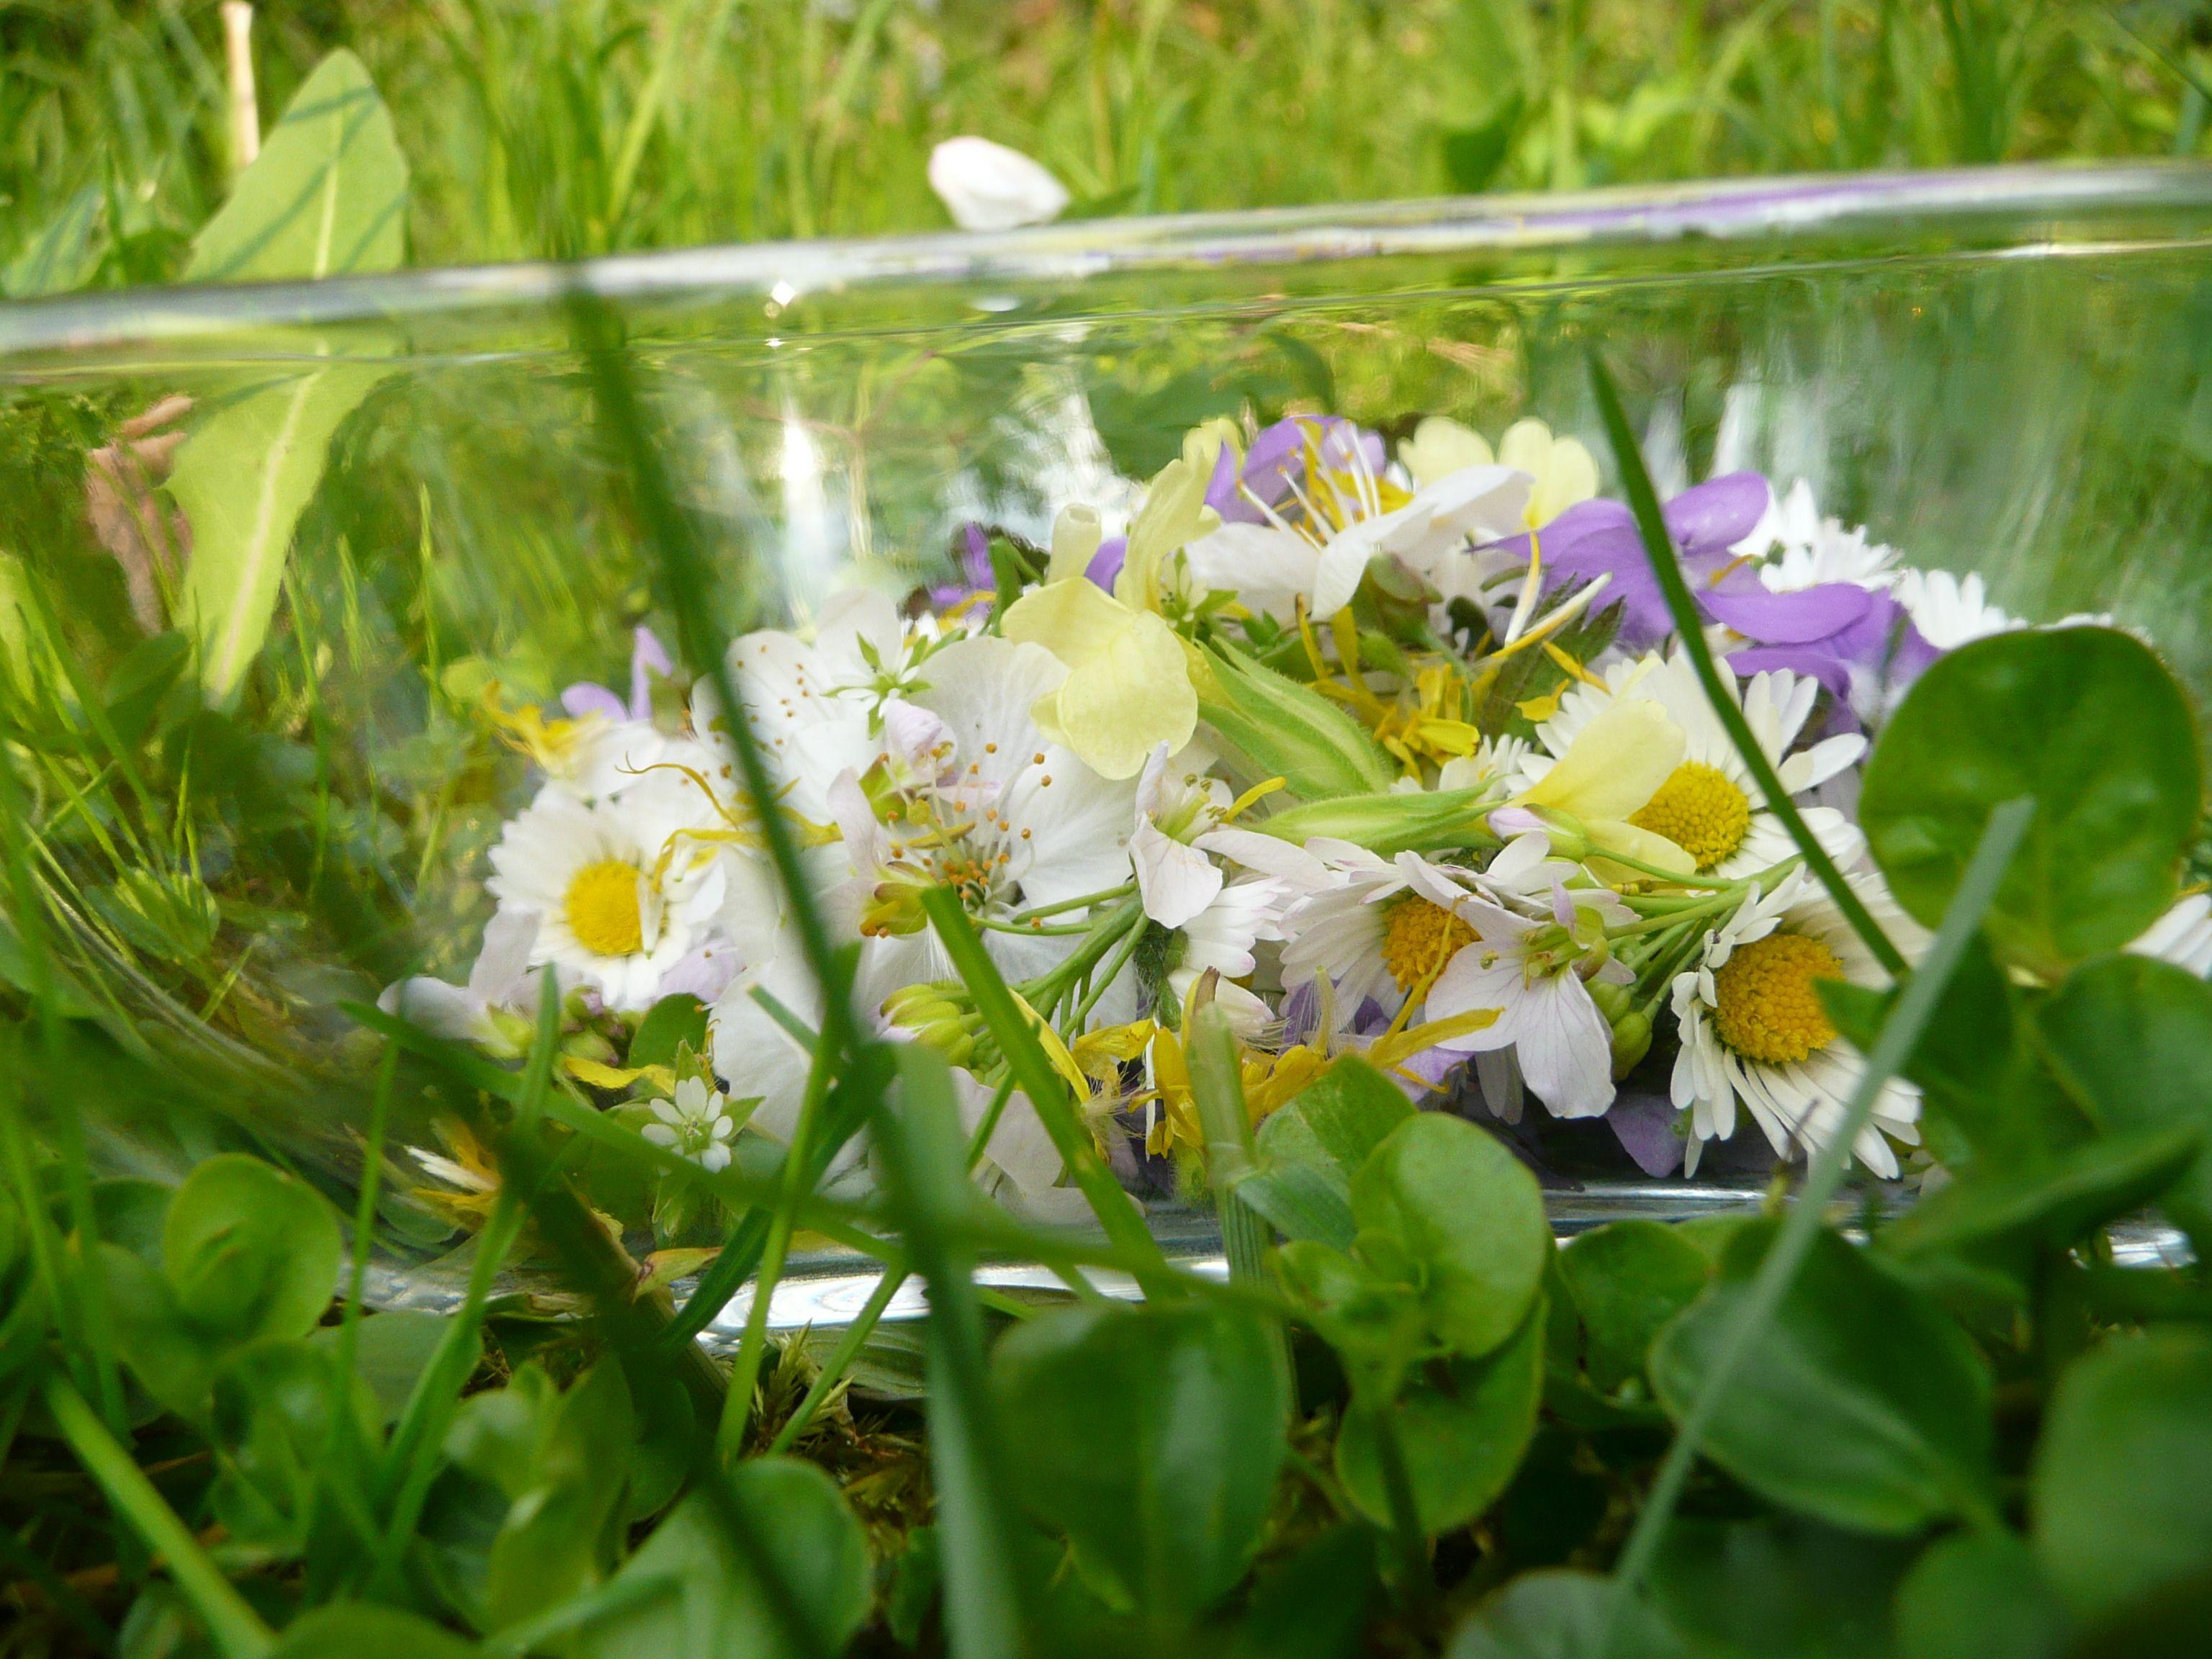 2017.3.20 Blütensalat